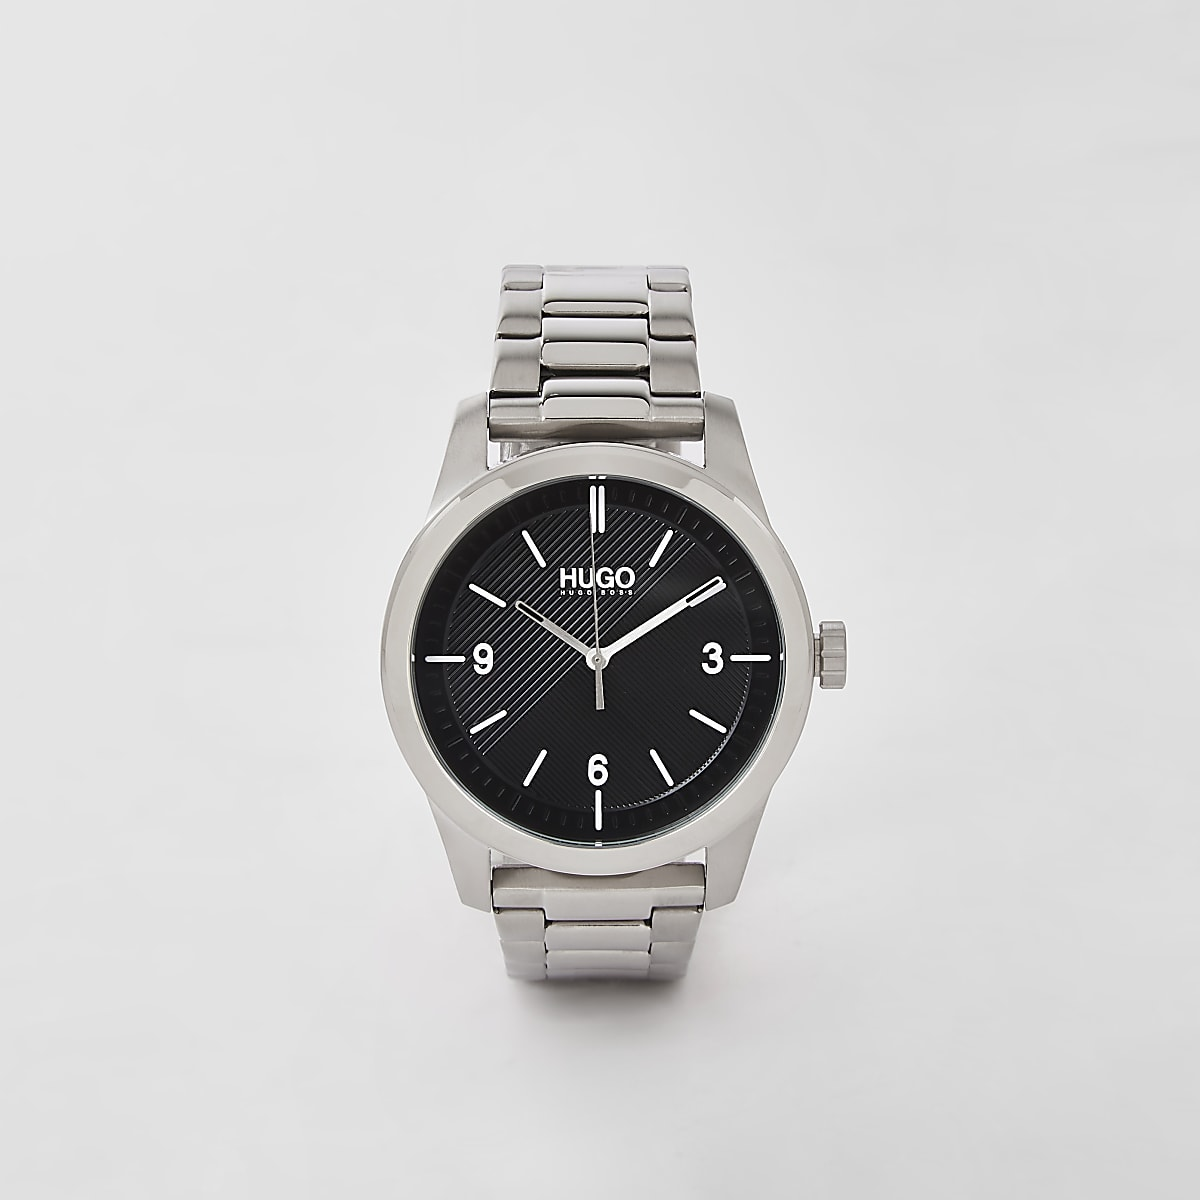 Hugo Create grey stainless steel watch